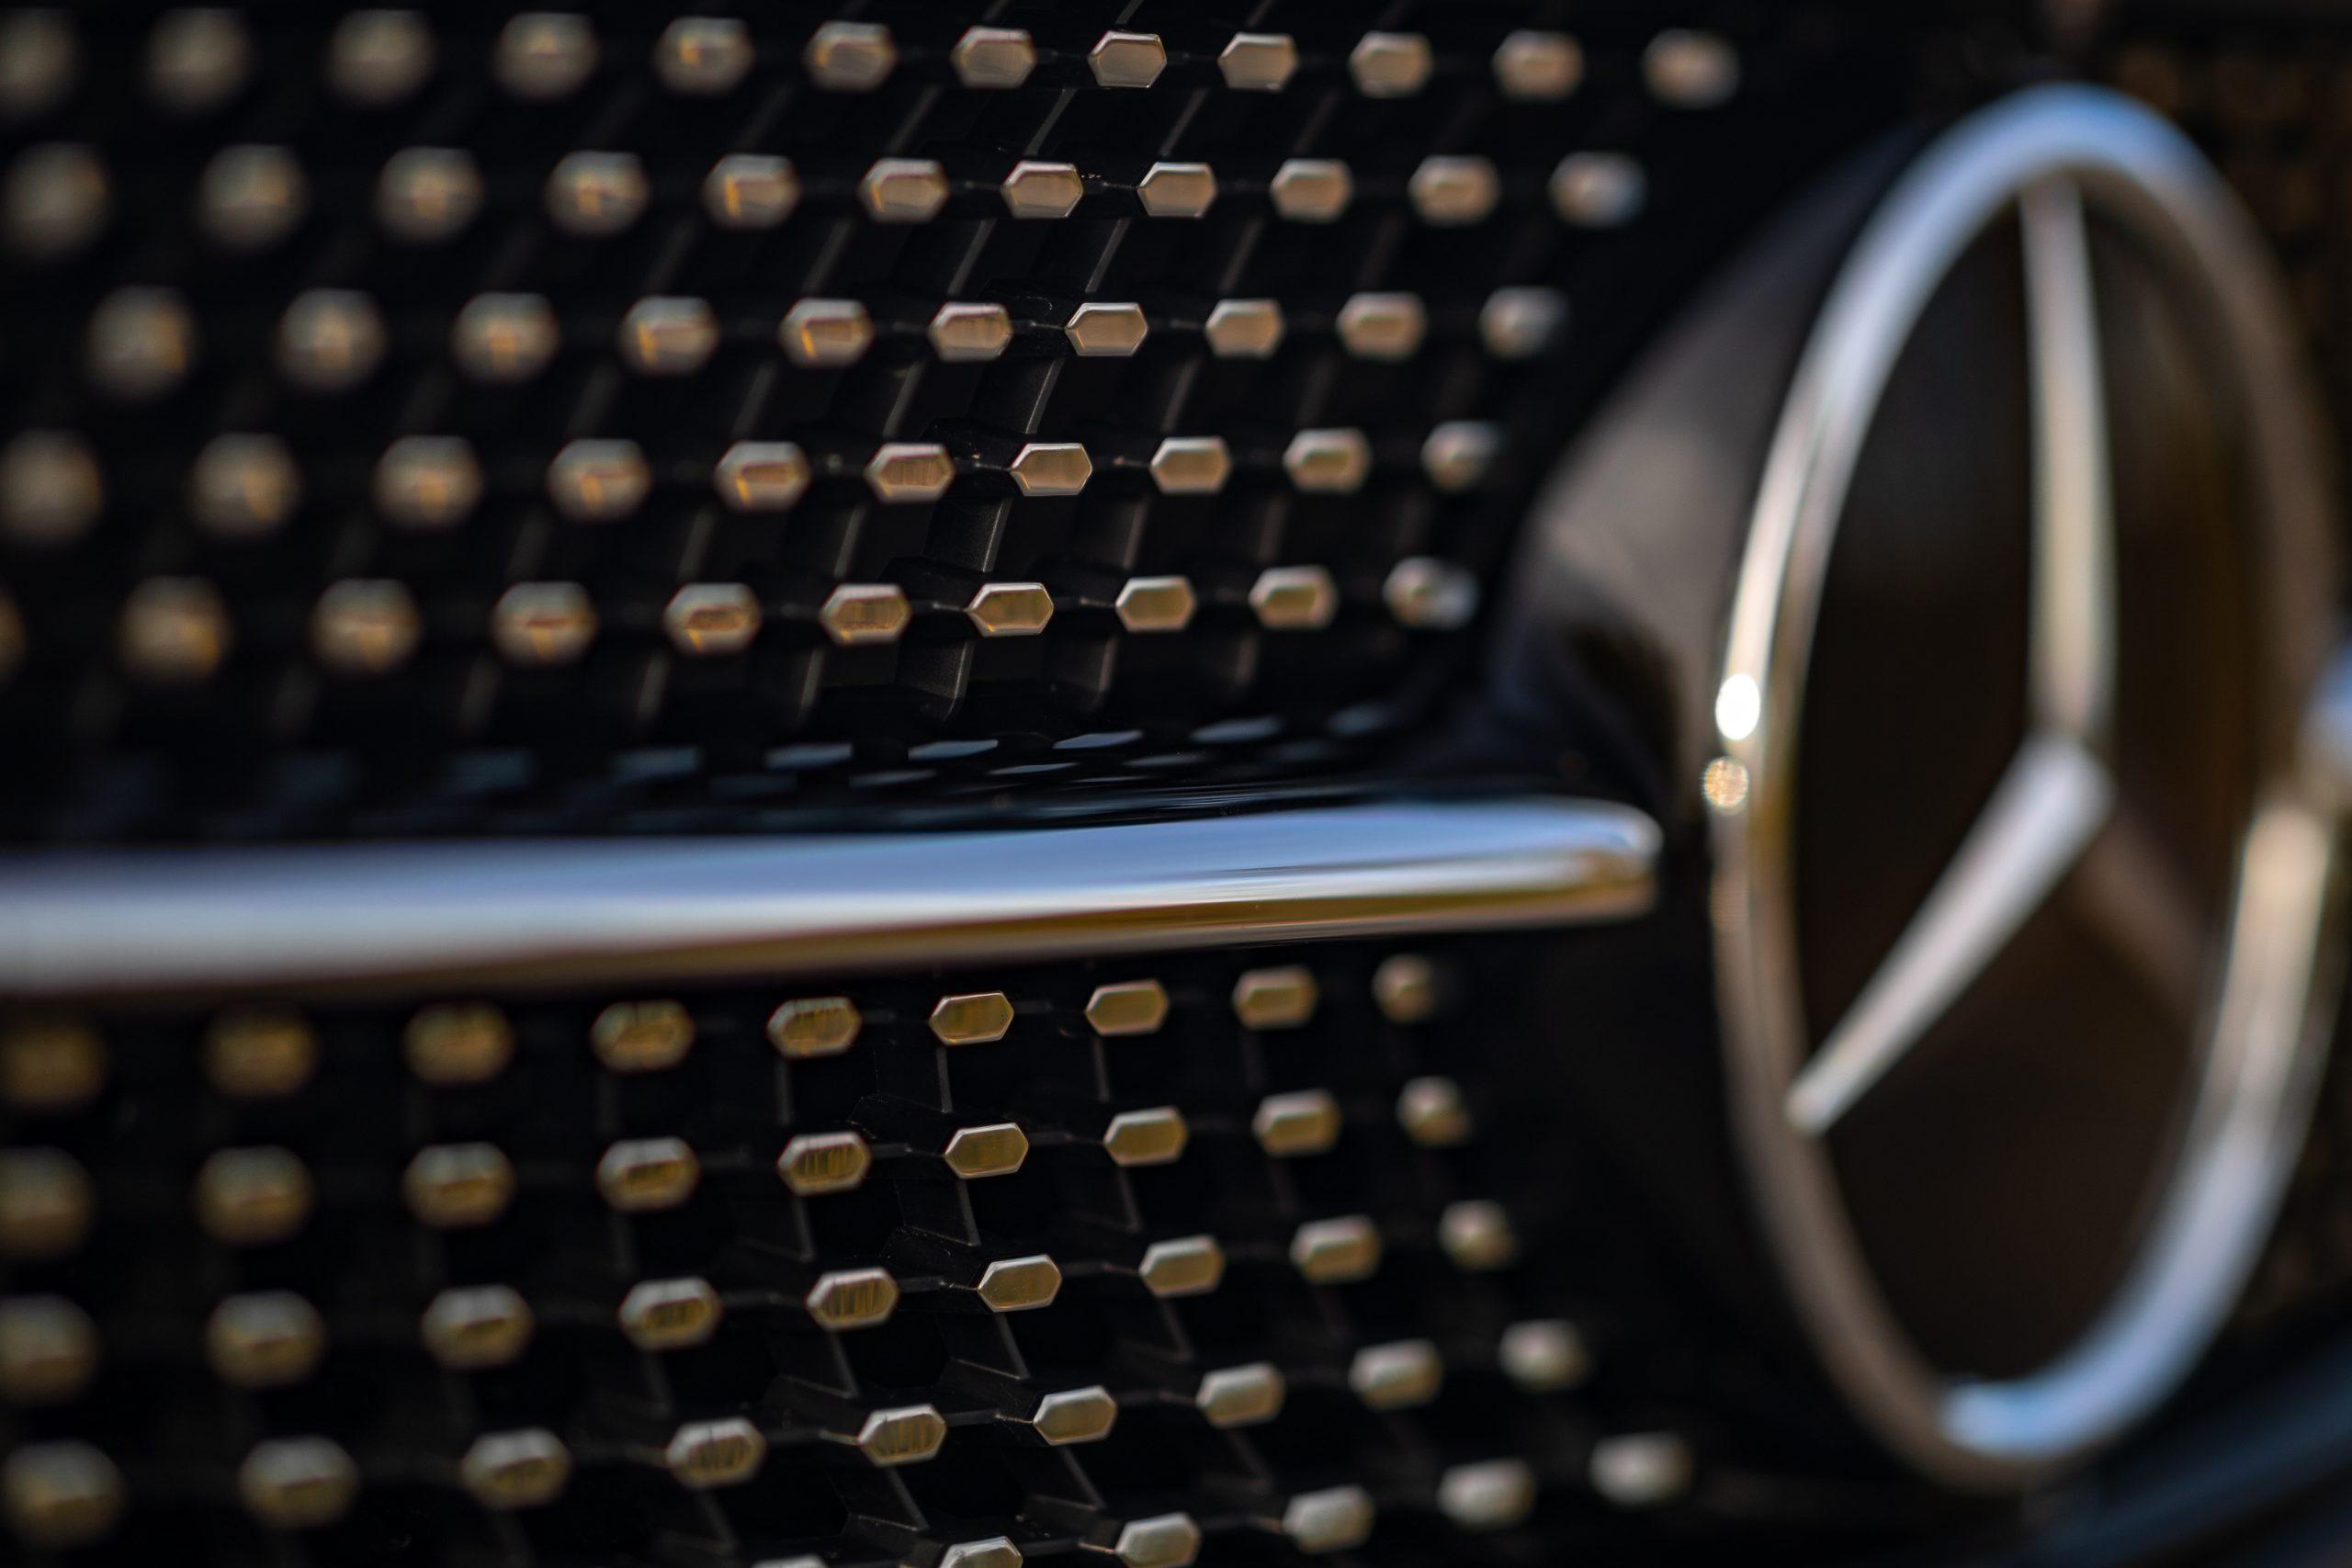 2021 Mercedes Benz E 450 4MATIC front grille texture detail